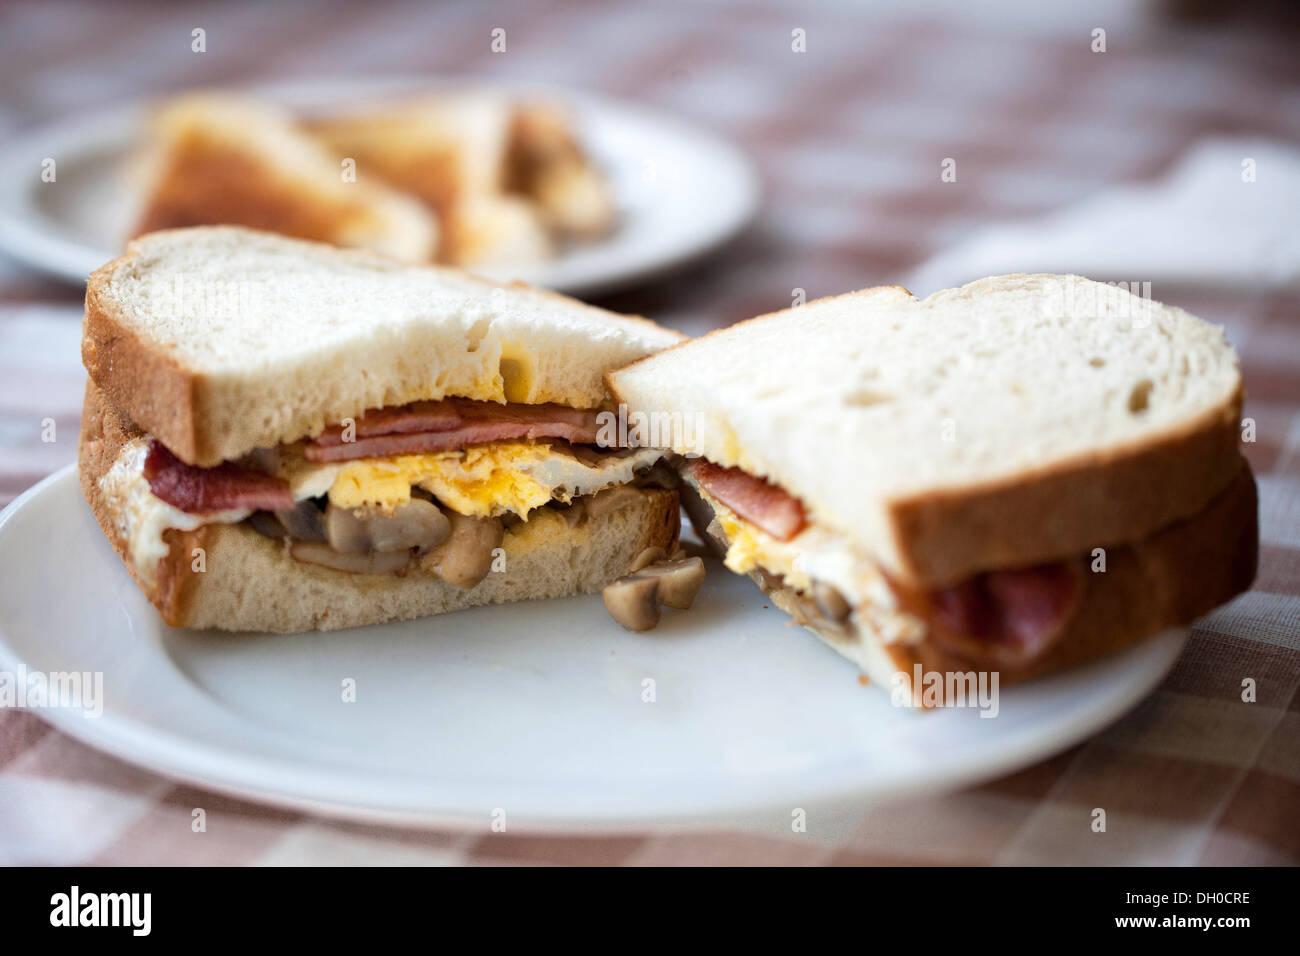 Bacon, egg and mushroom sandwich, British food. Stock Photo